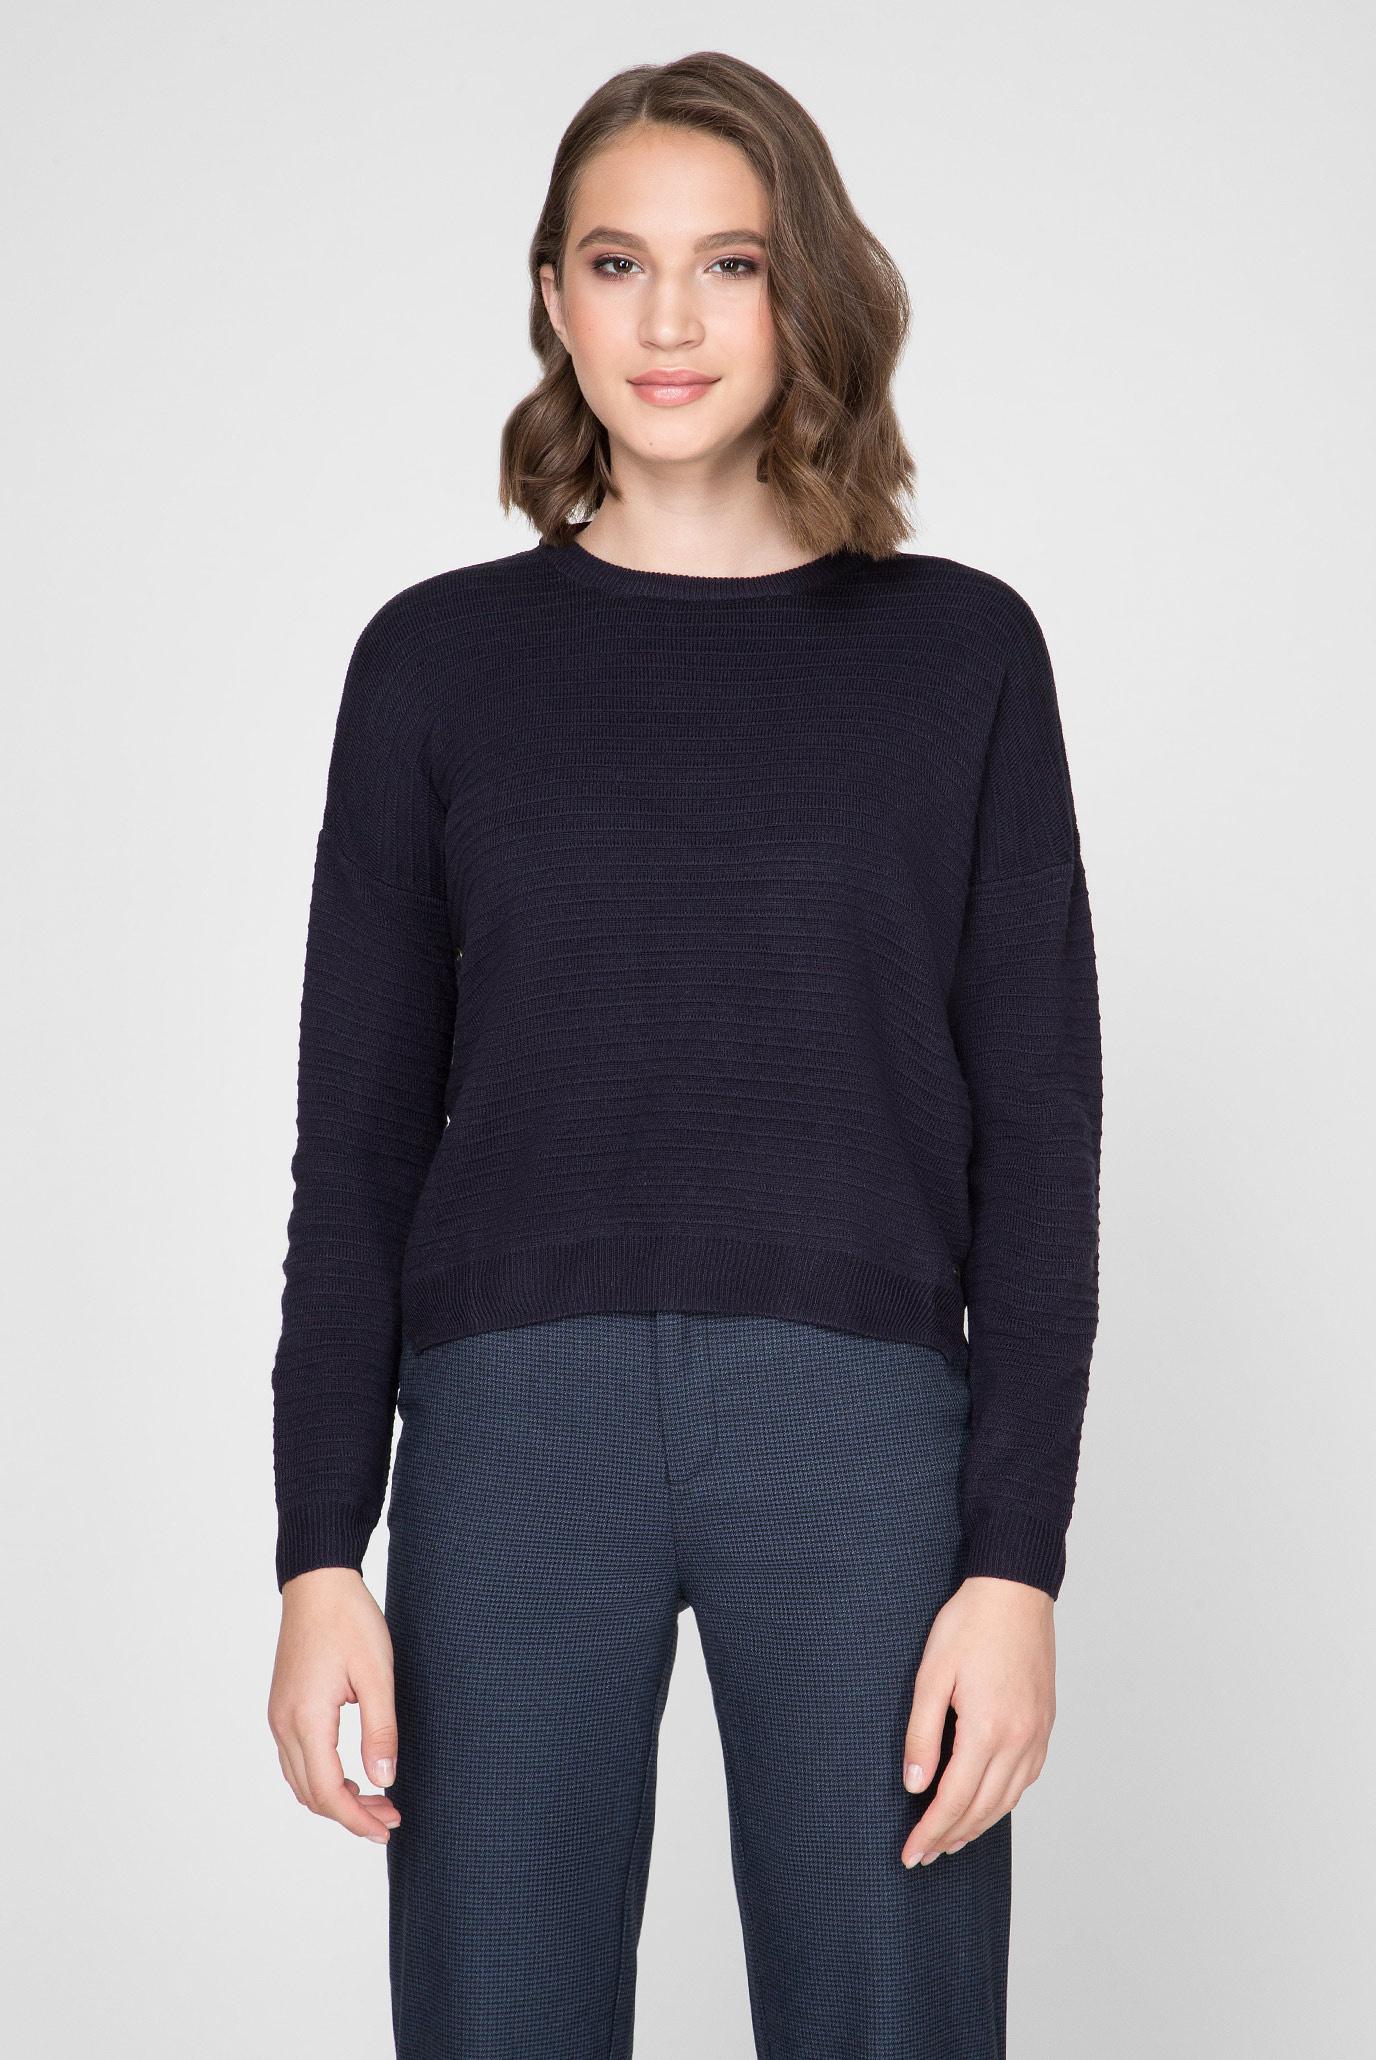 Женский темно-синий джемпер CELIA Pepe Jeans